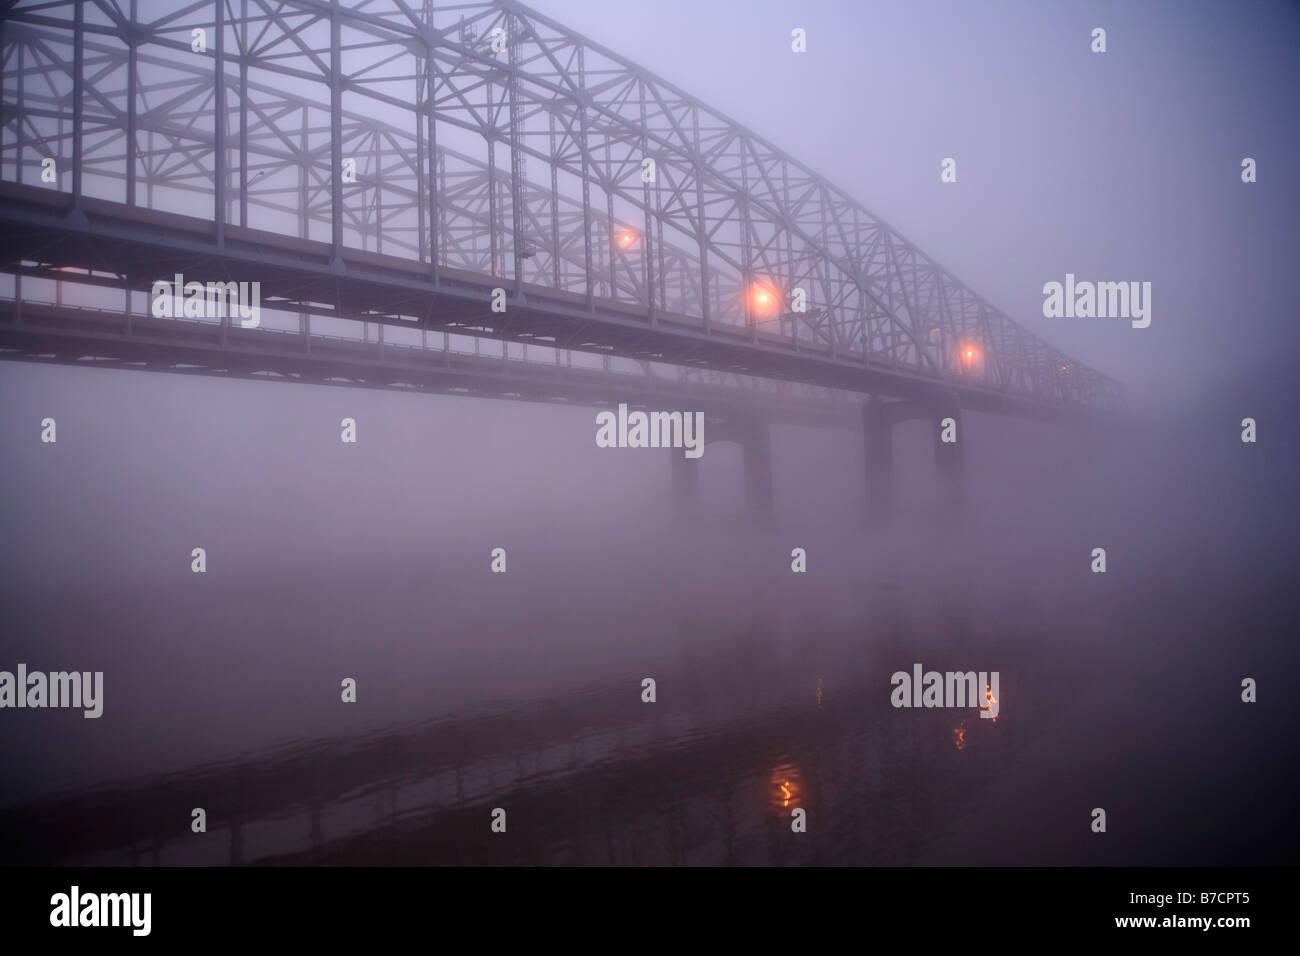 Missouri River Bridge - Stock Image